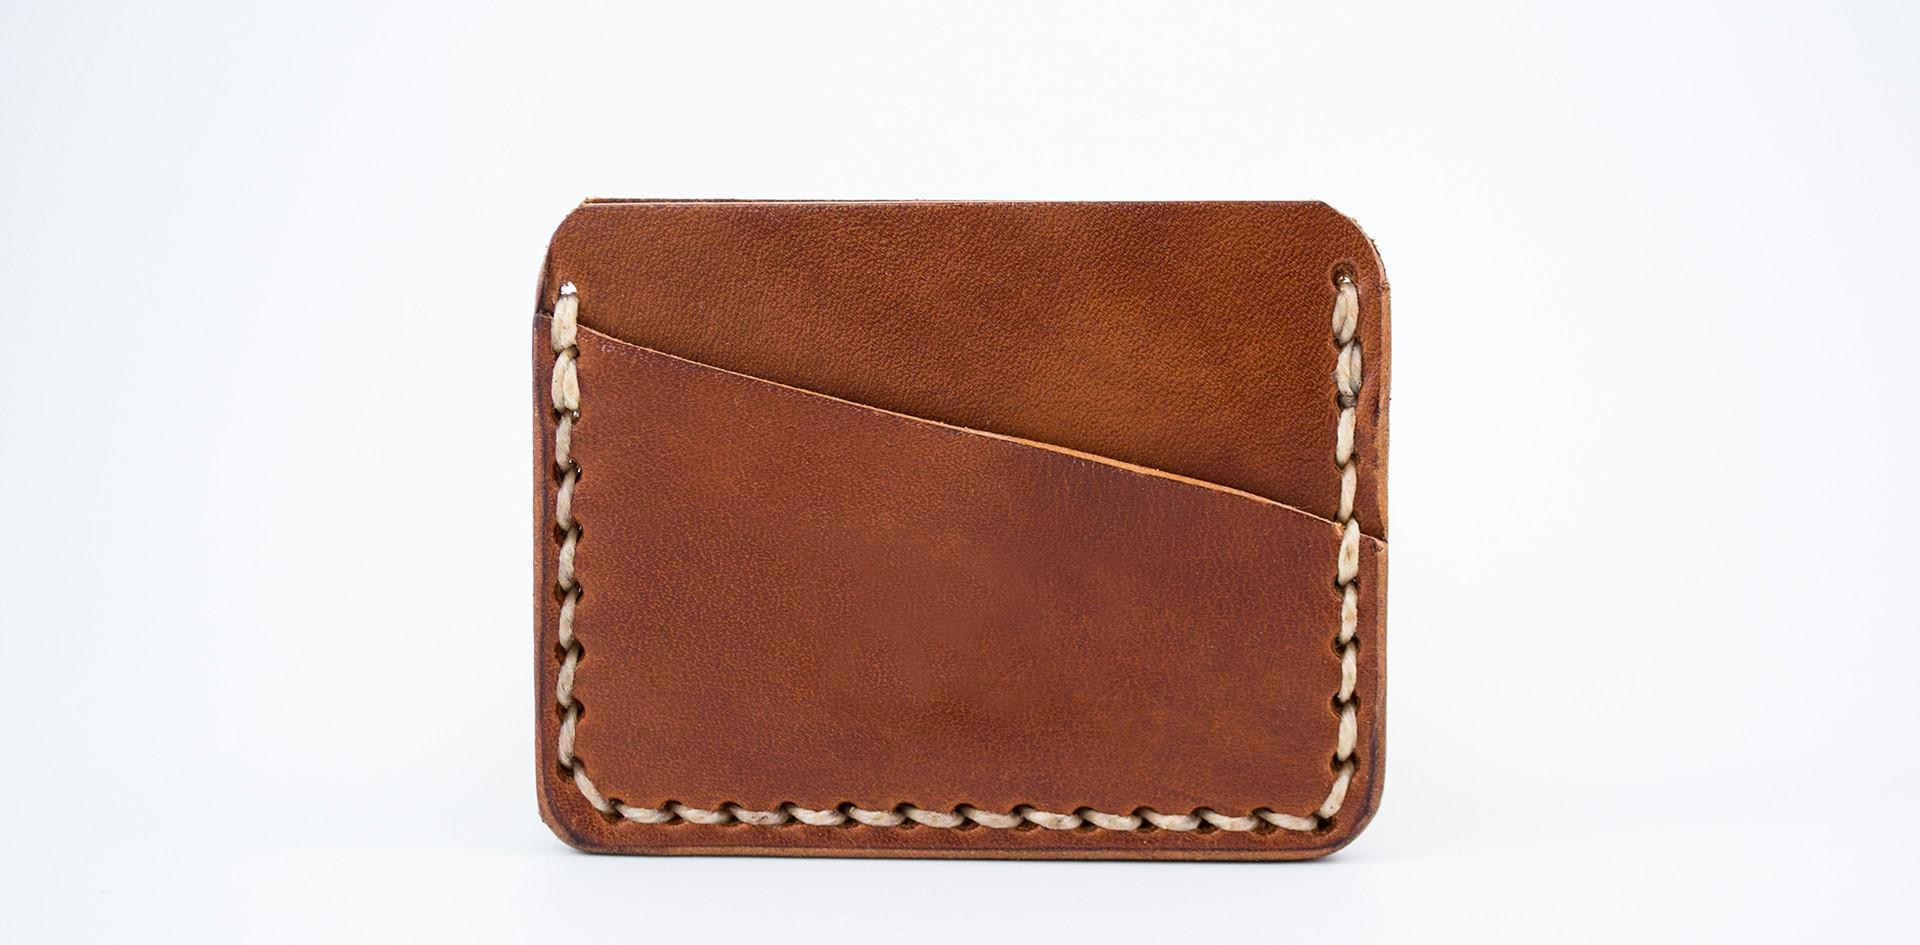 Wallet7 - Blank.jpg